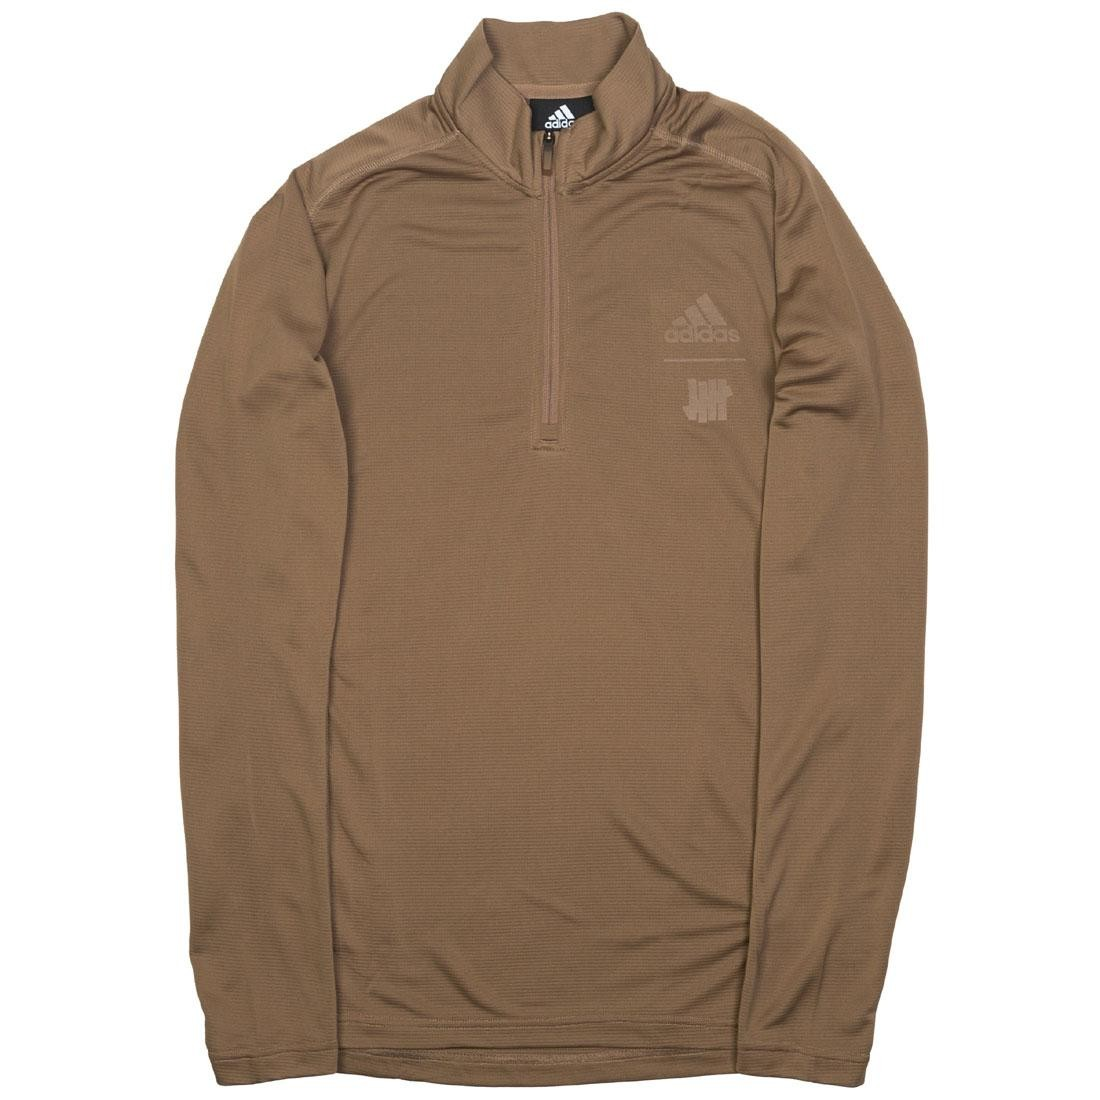 Adidas x Undefeated Men Running Half-Zip Sweatshirt (khaki / tactile khaki)